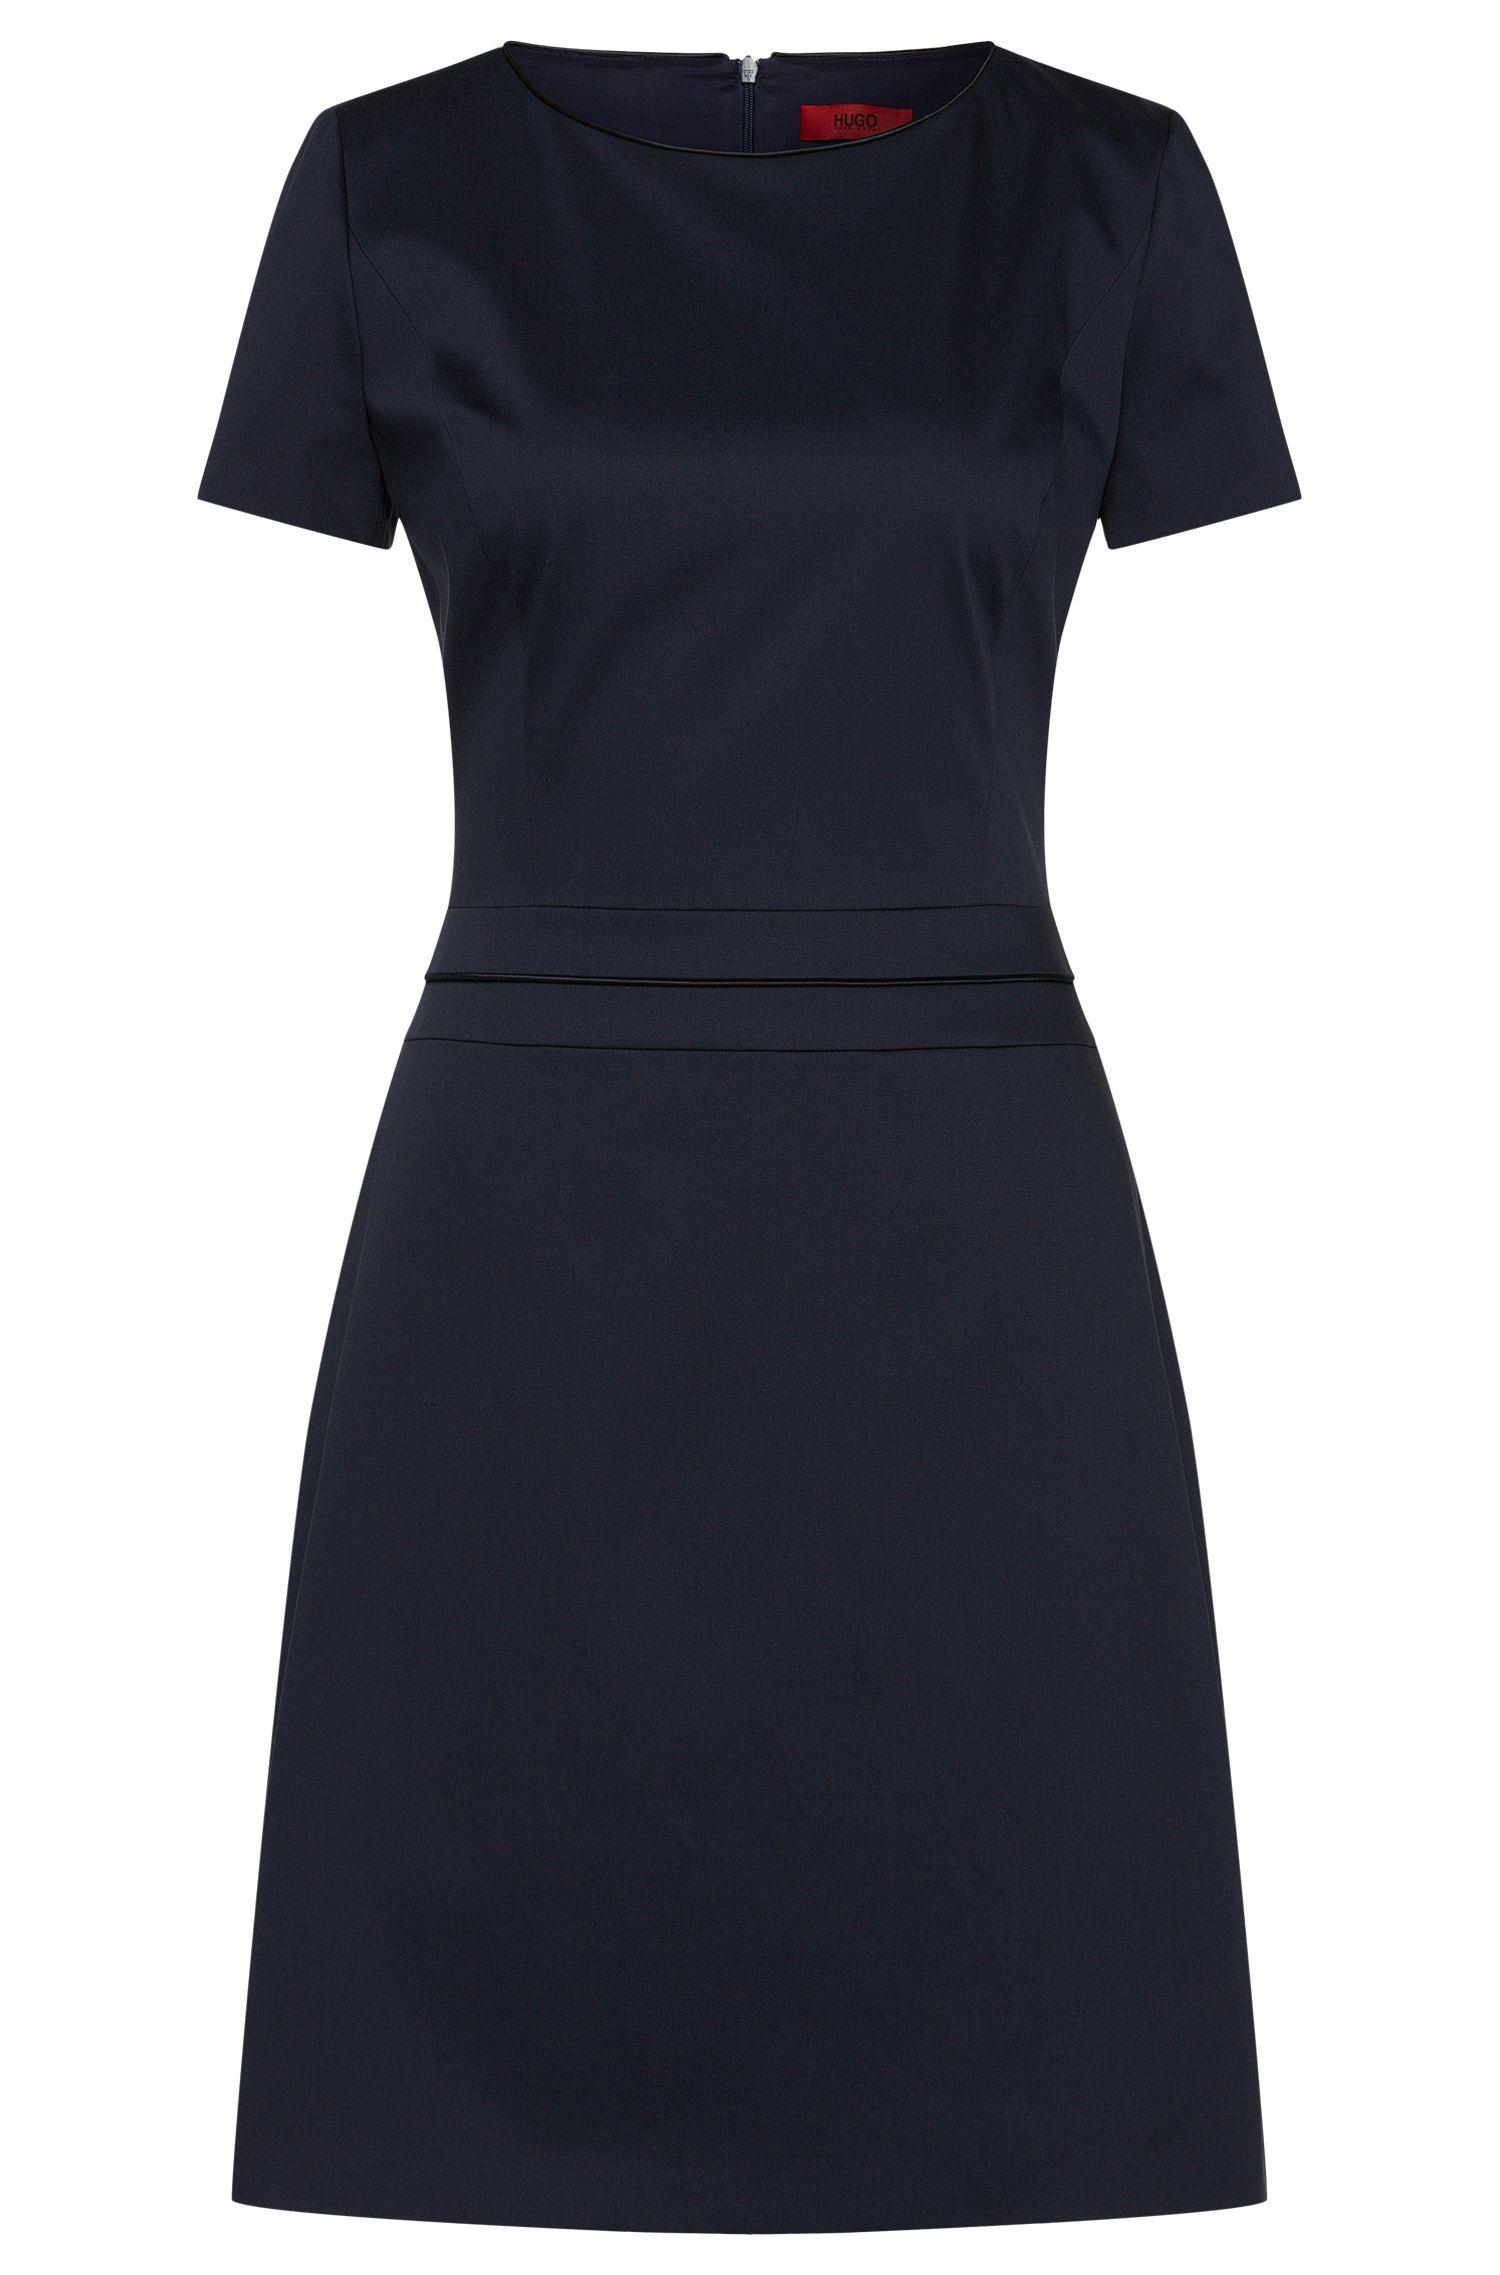 Short-sleeved dress in stretch cotton: 'Katniss'